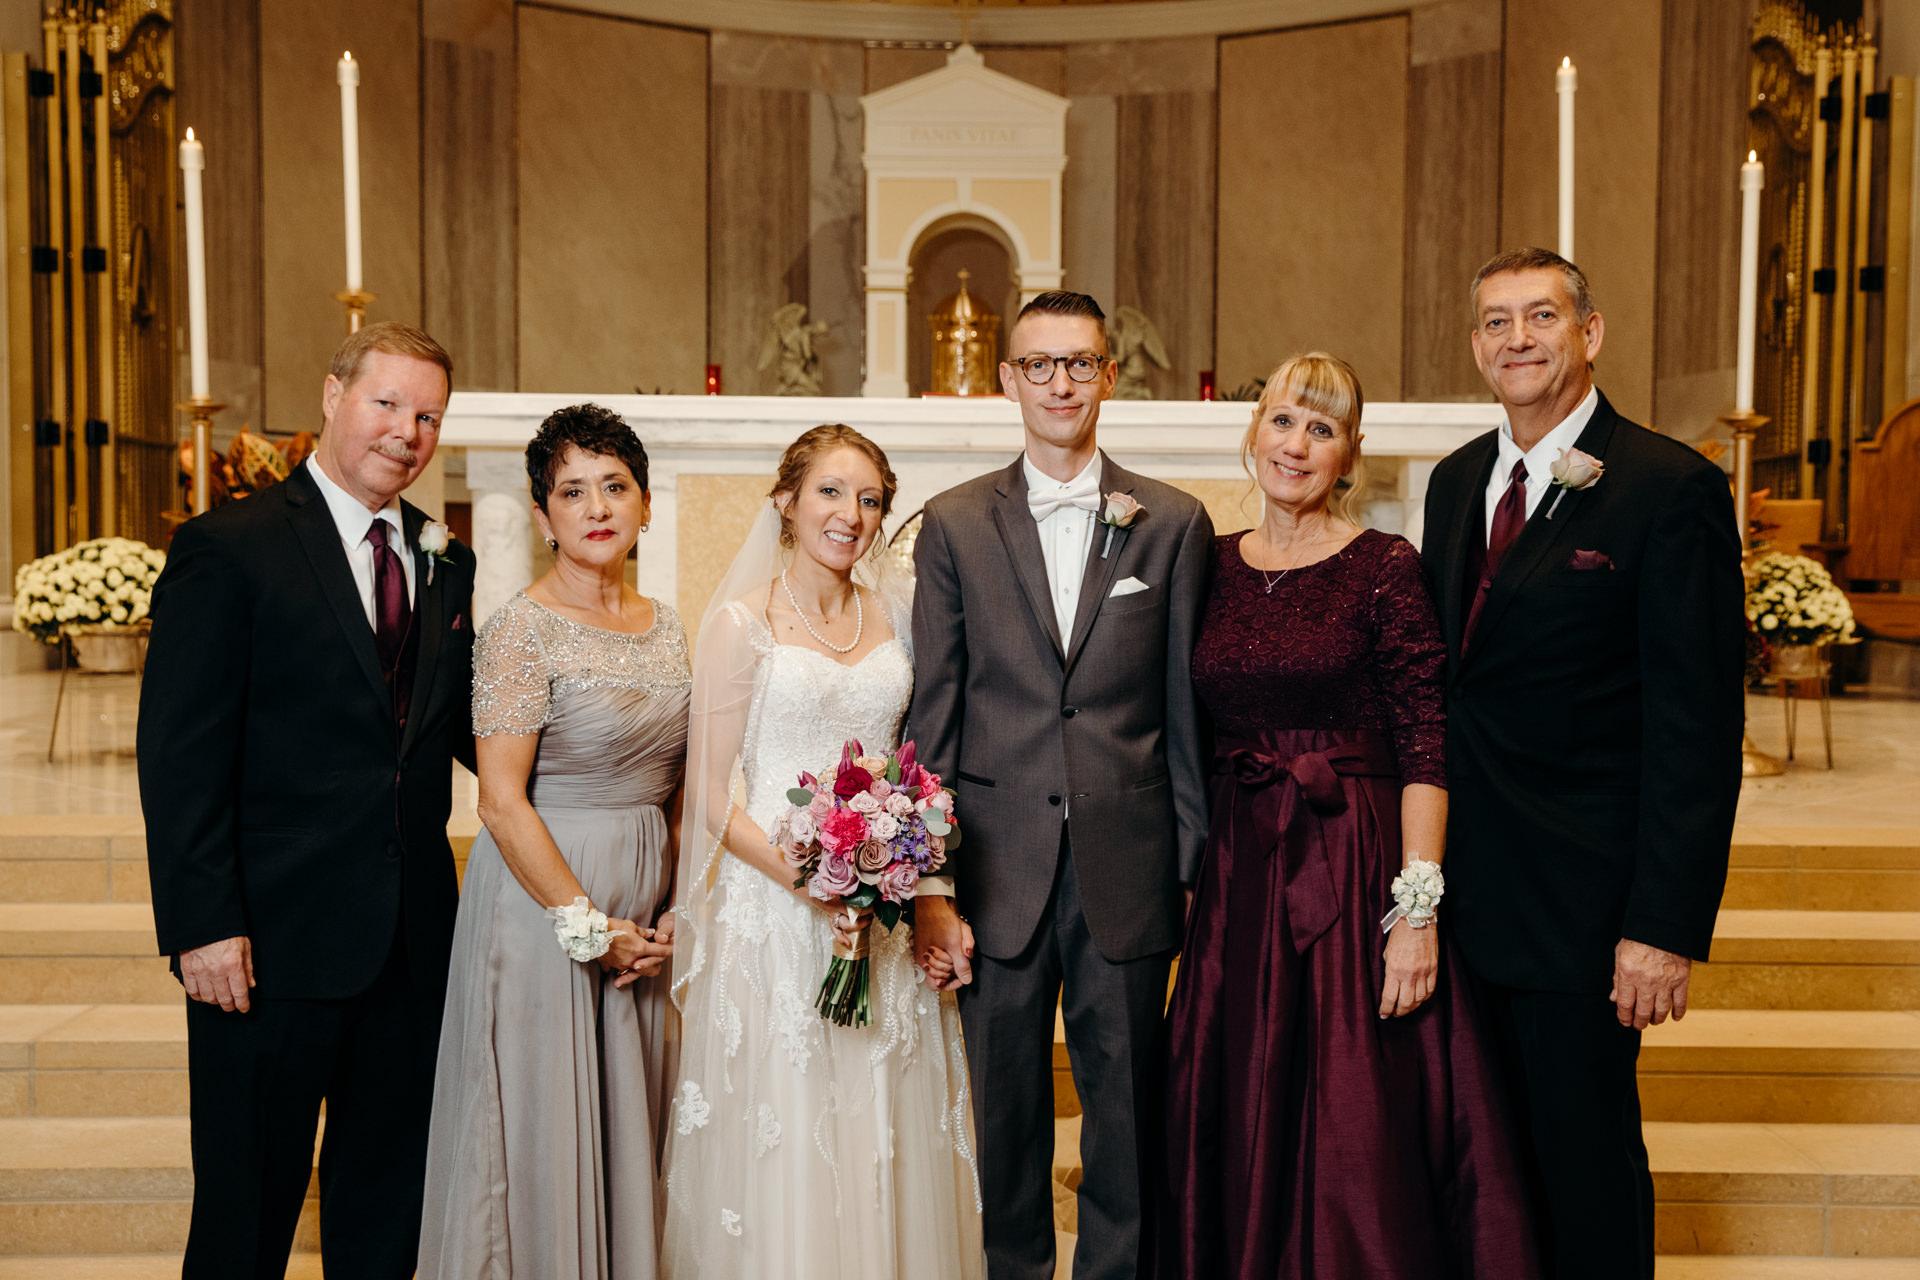 Armory wedding south bend grant beachy photography elkhart goshen -047.jpg